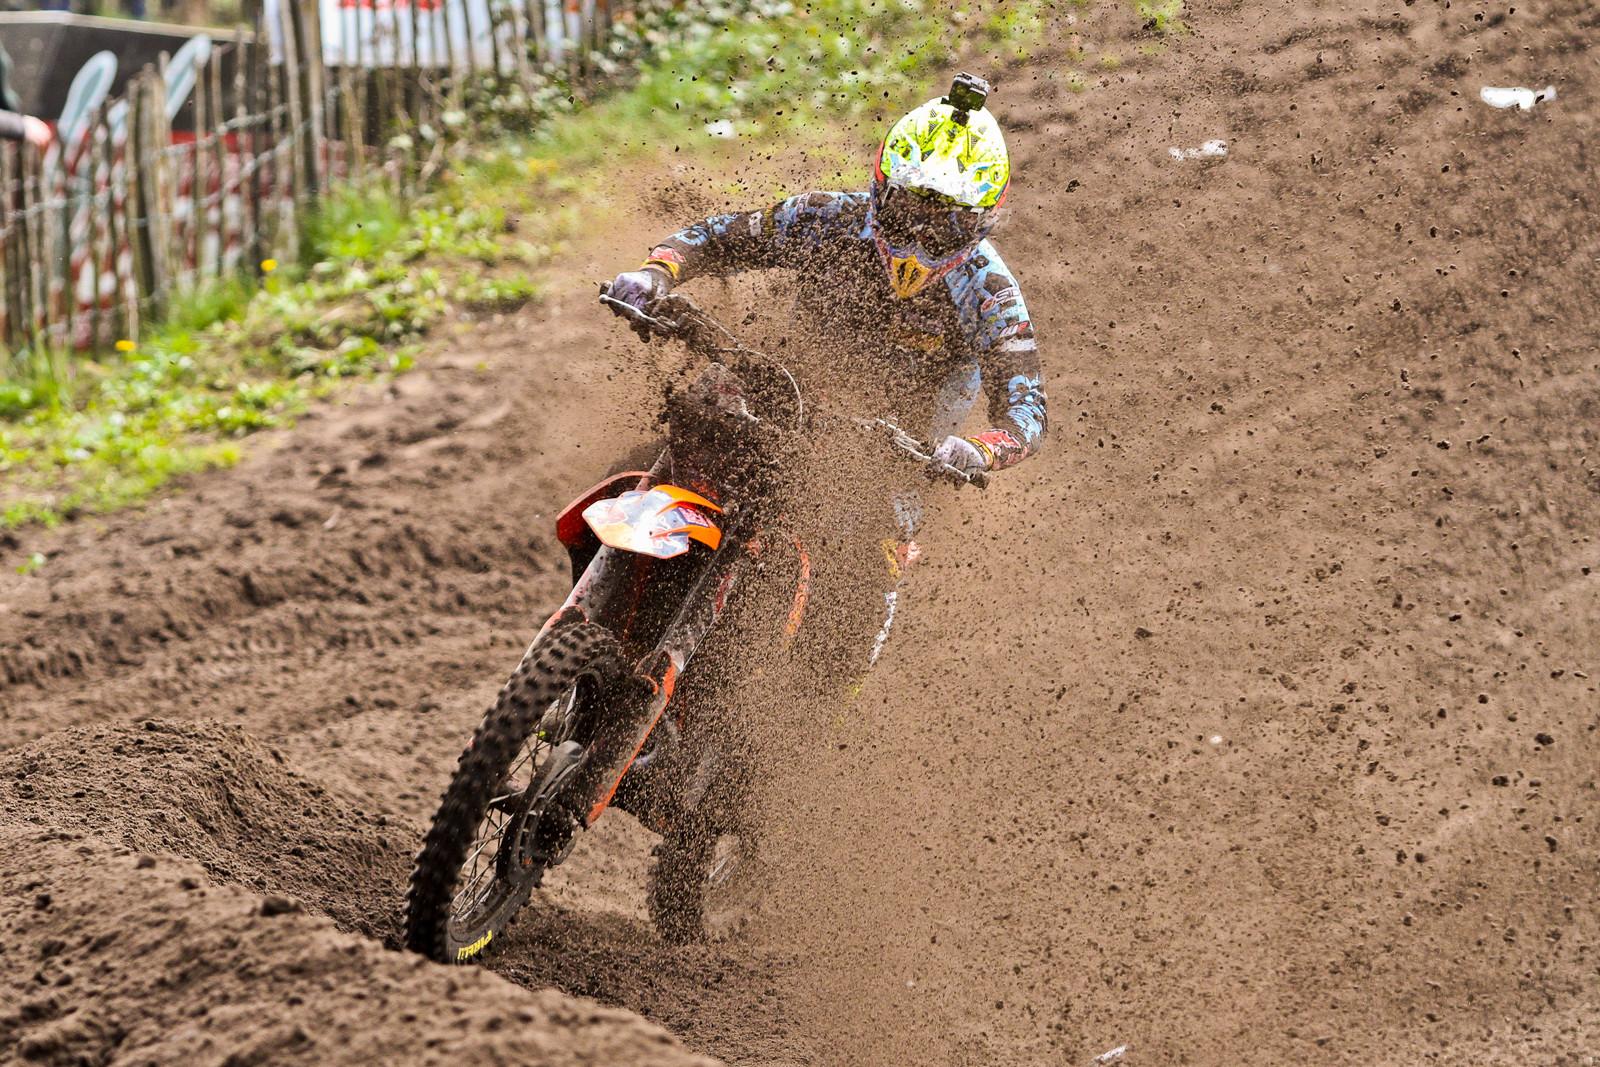 Antonio Cairoli Vision - Photo Blast: 2017 MXGP of Valkenswaard - Motocross Pictures - Vital MX